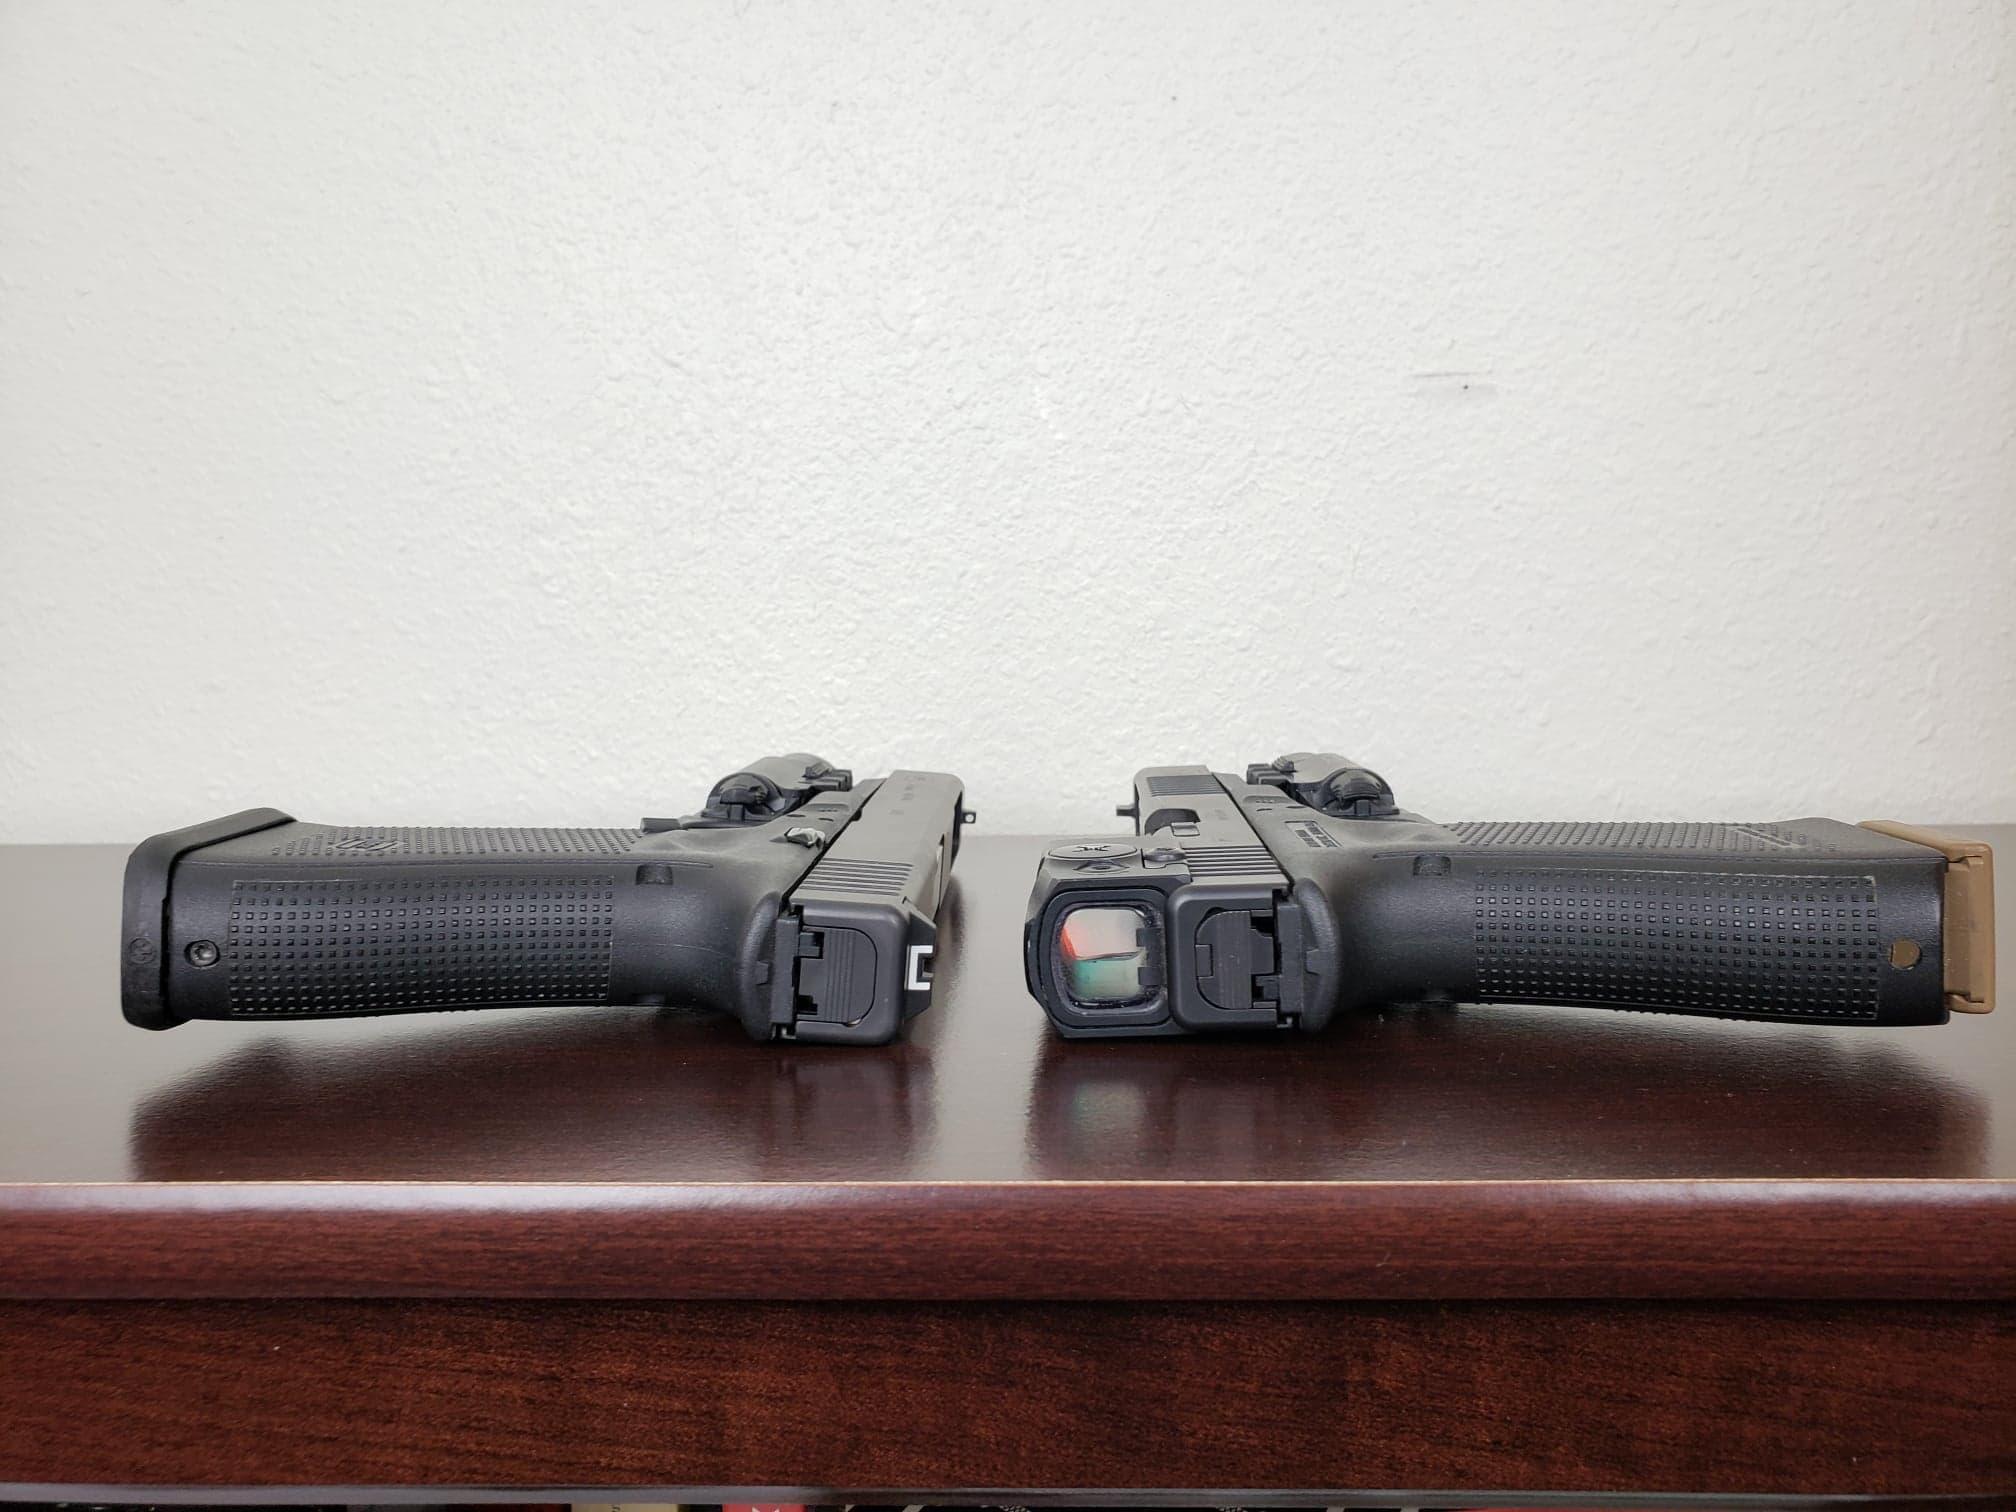 Irons vs Red Dots on Handguns